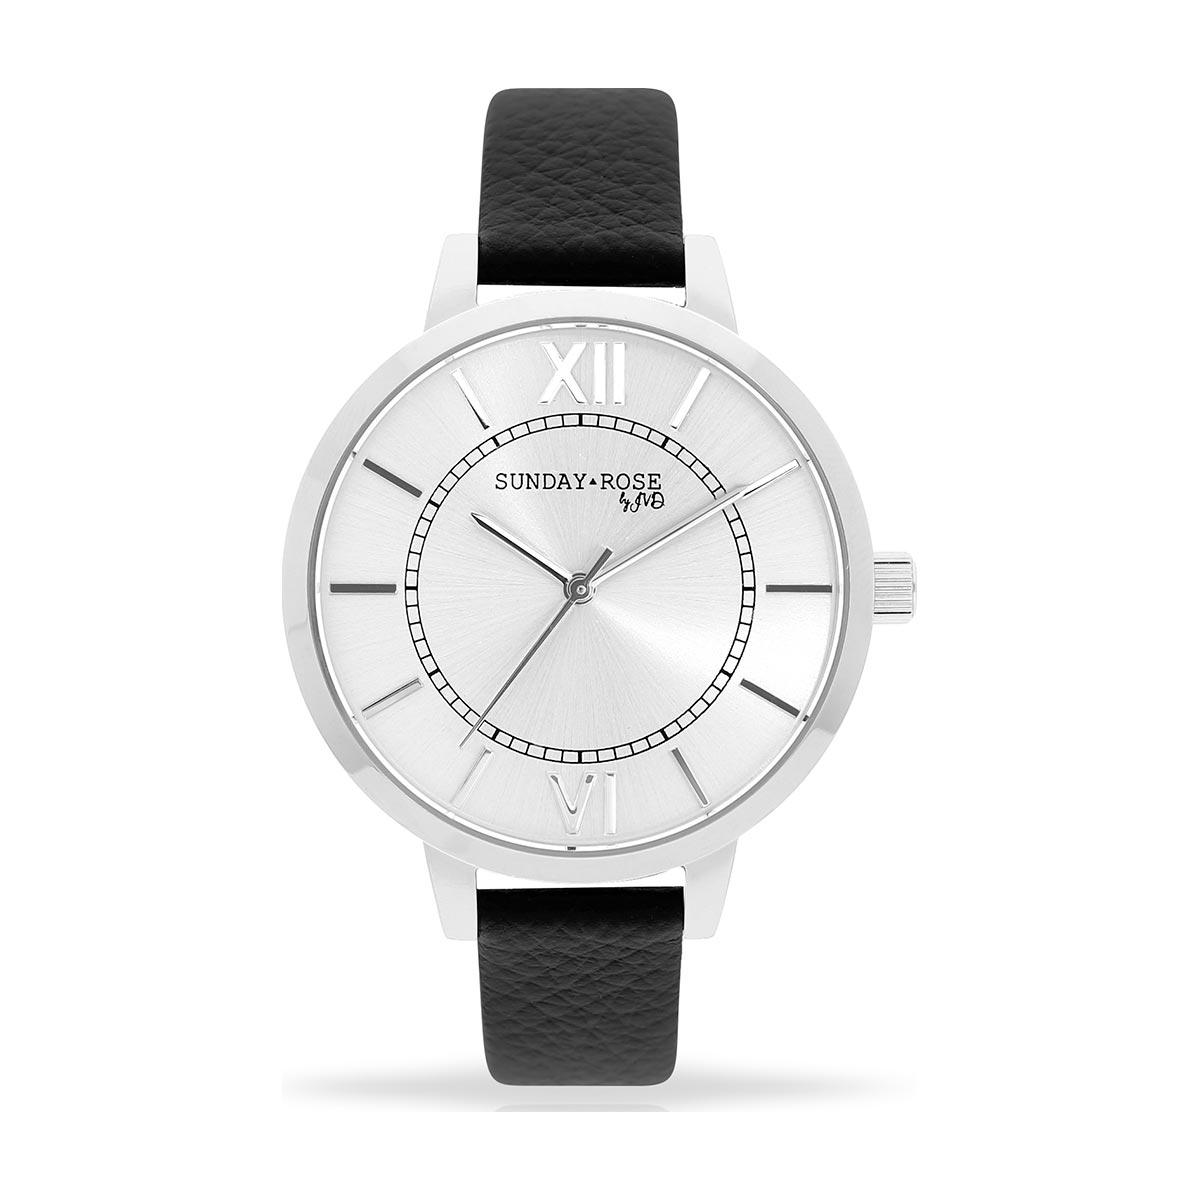 e1e78117c Dámské hodinky SUNDAY ROSE Classic FOREVER BLACK - Hodinky Casio a ...